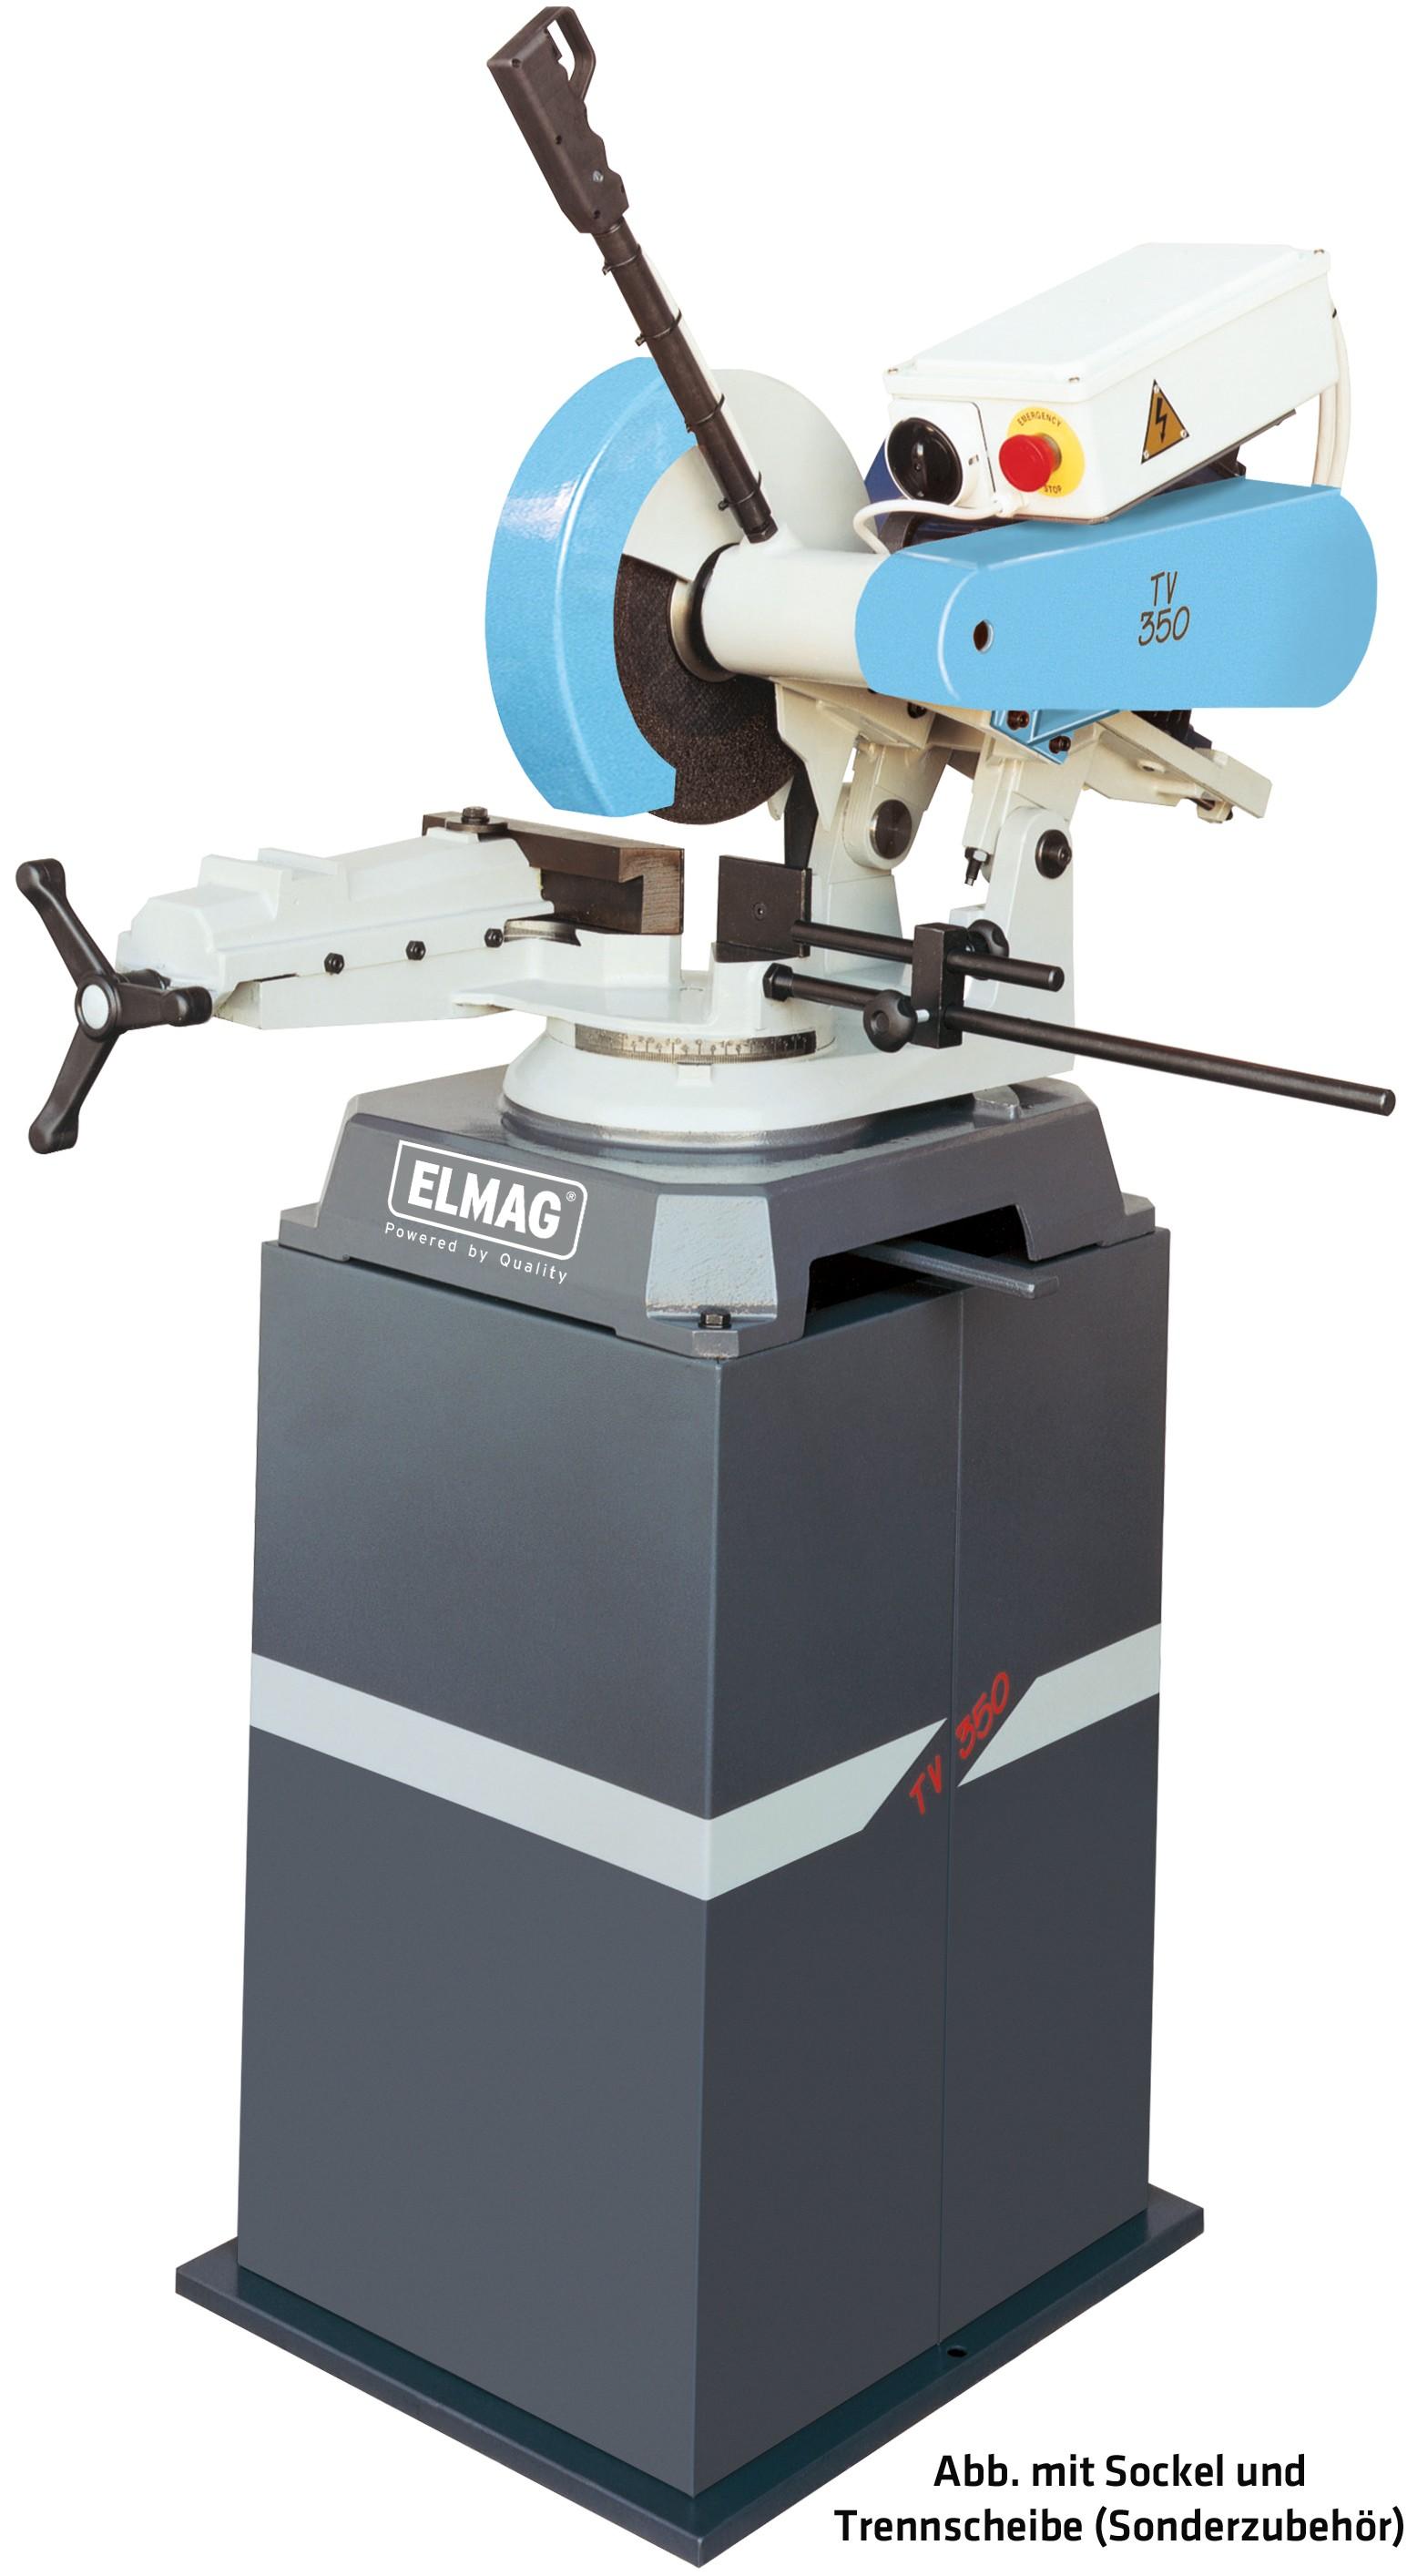 elmag metall-trennmaschine, 78065, 9004853780653 | dittmar - werkzeuge